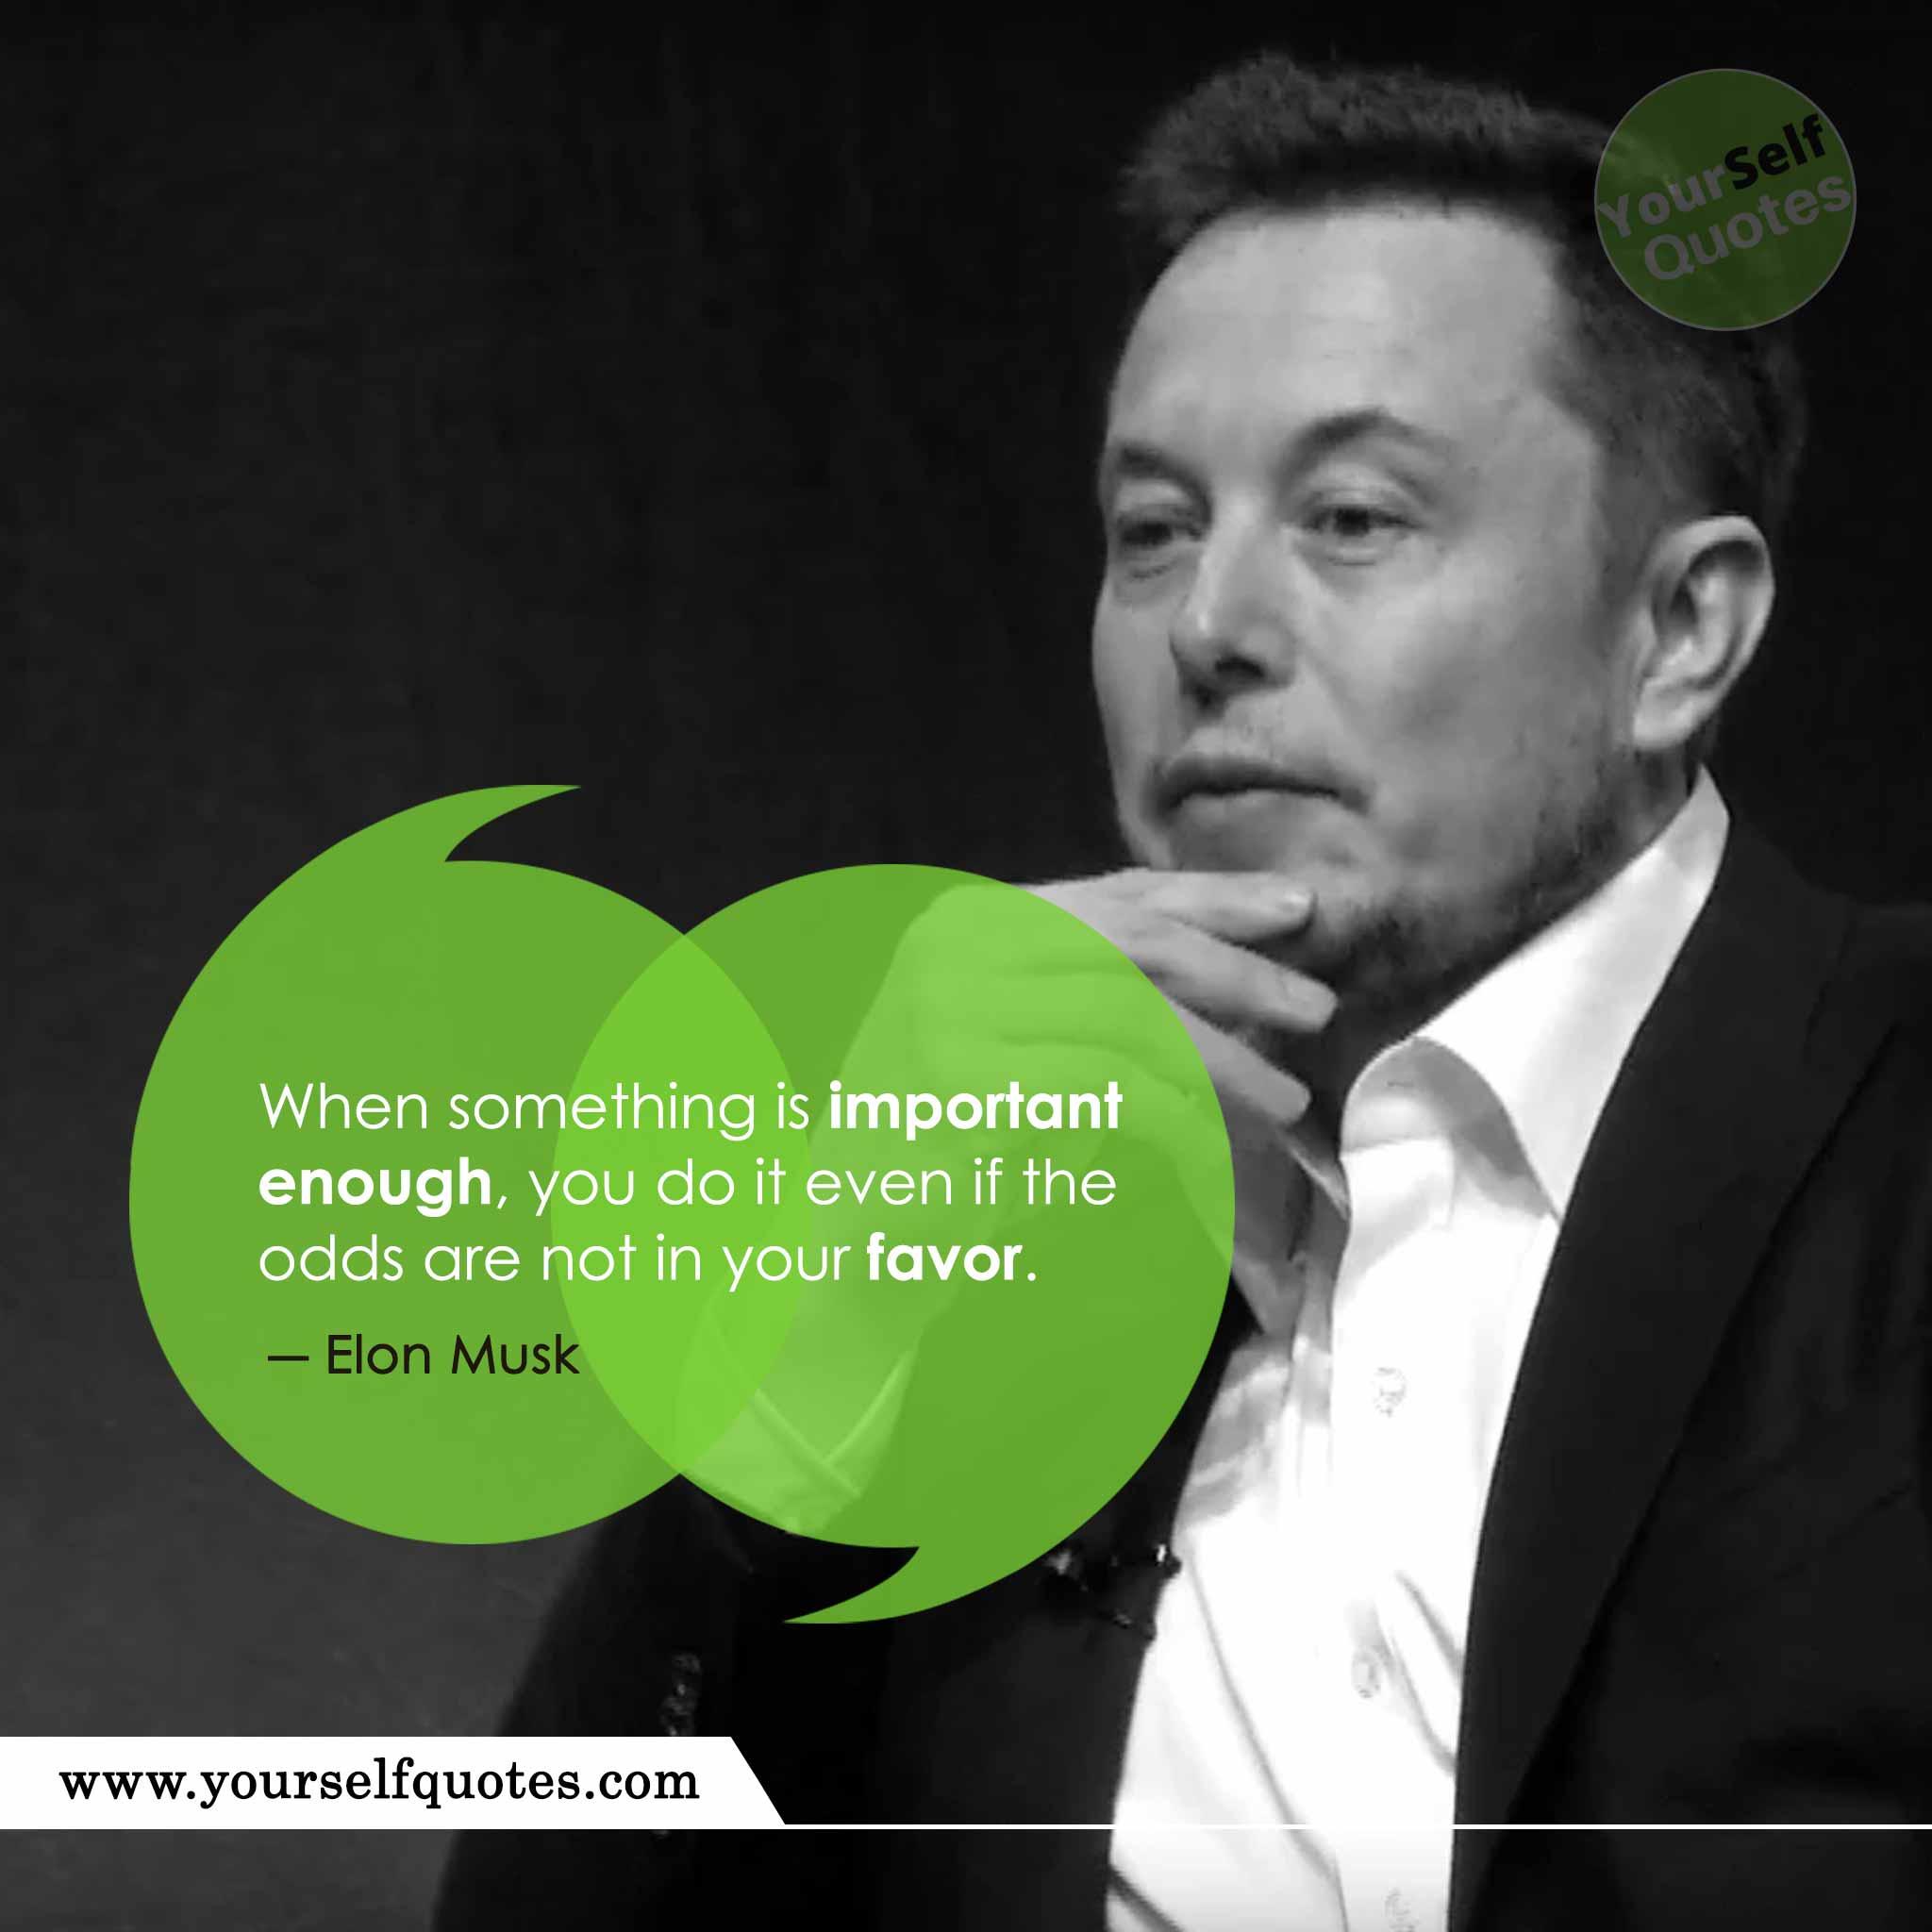 Inspirational Elon Musk Quotes